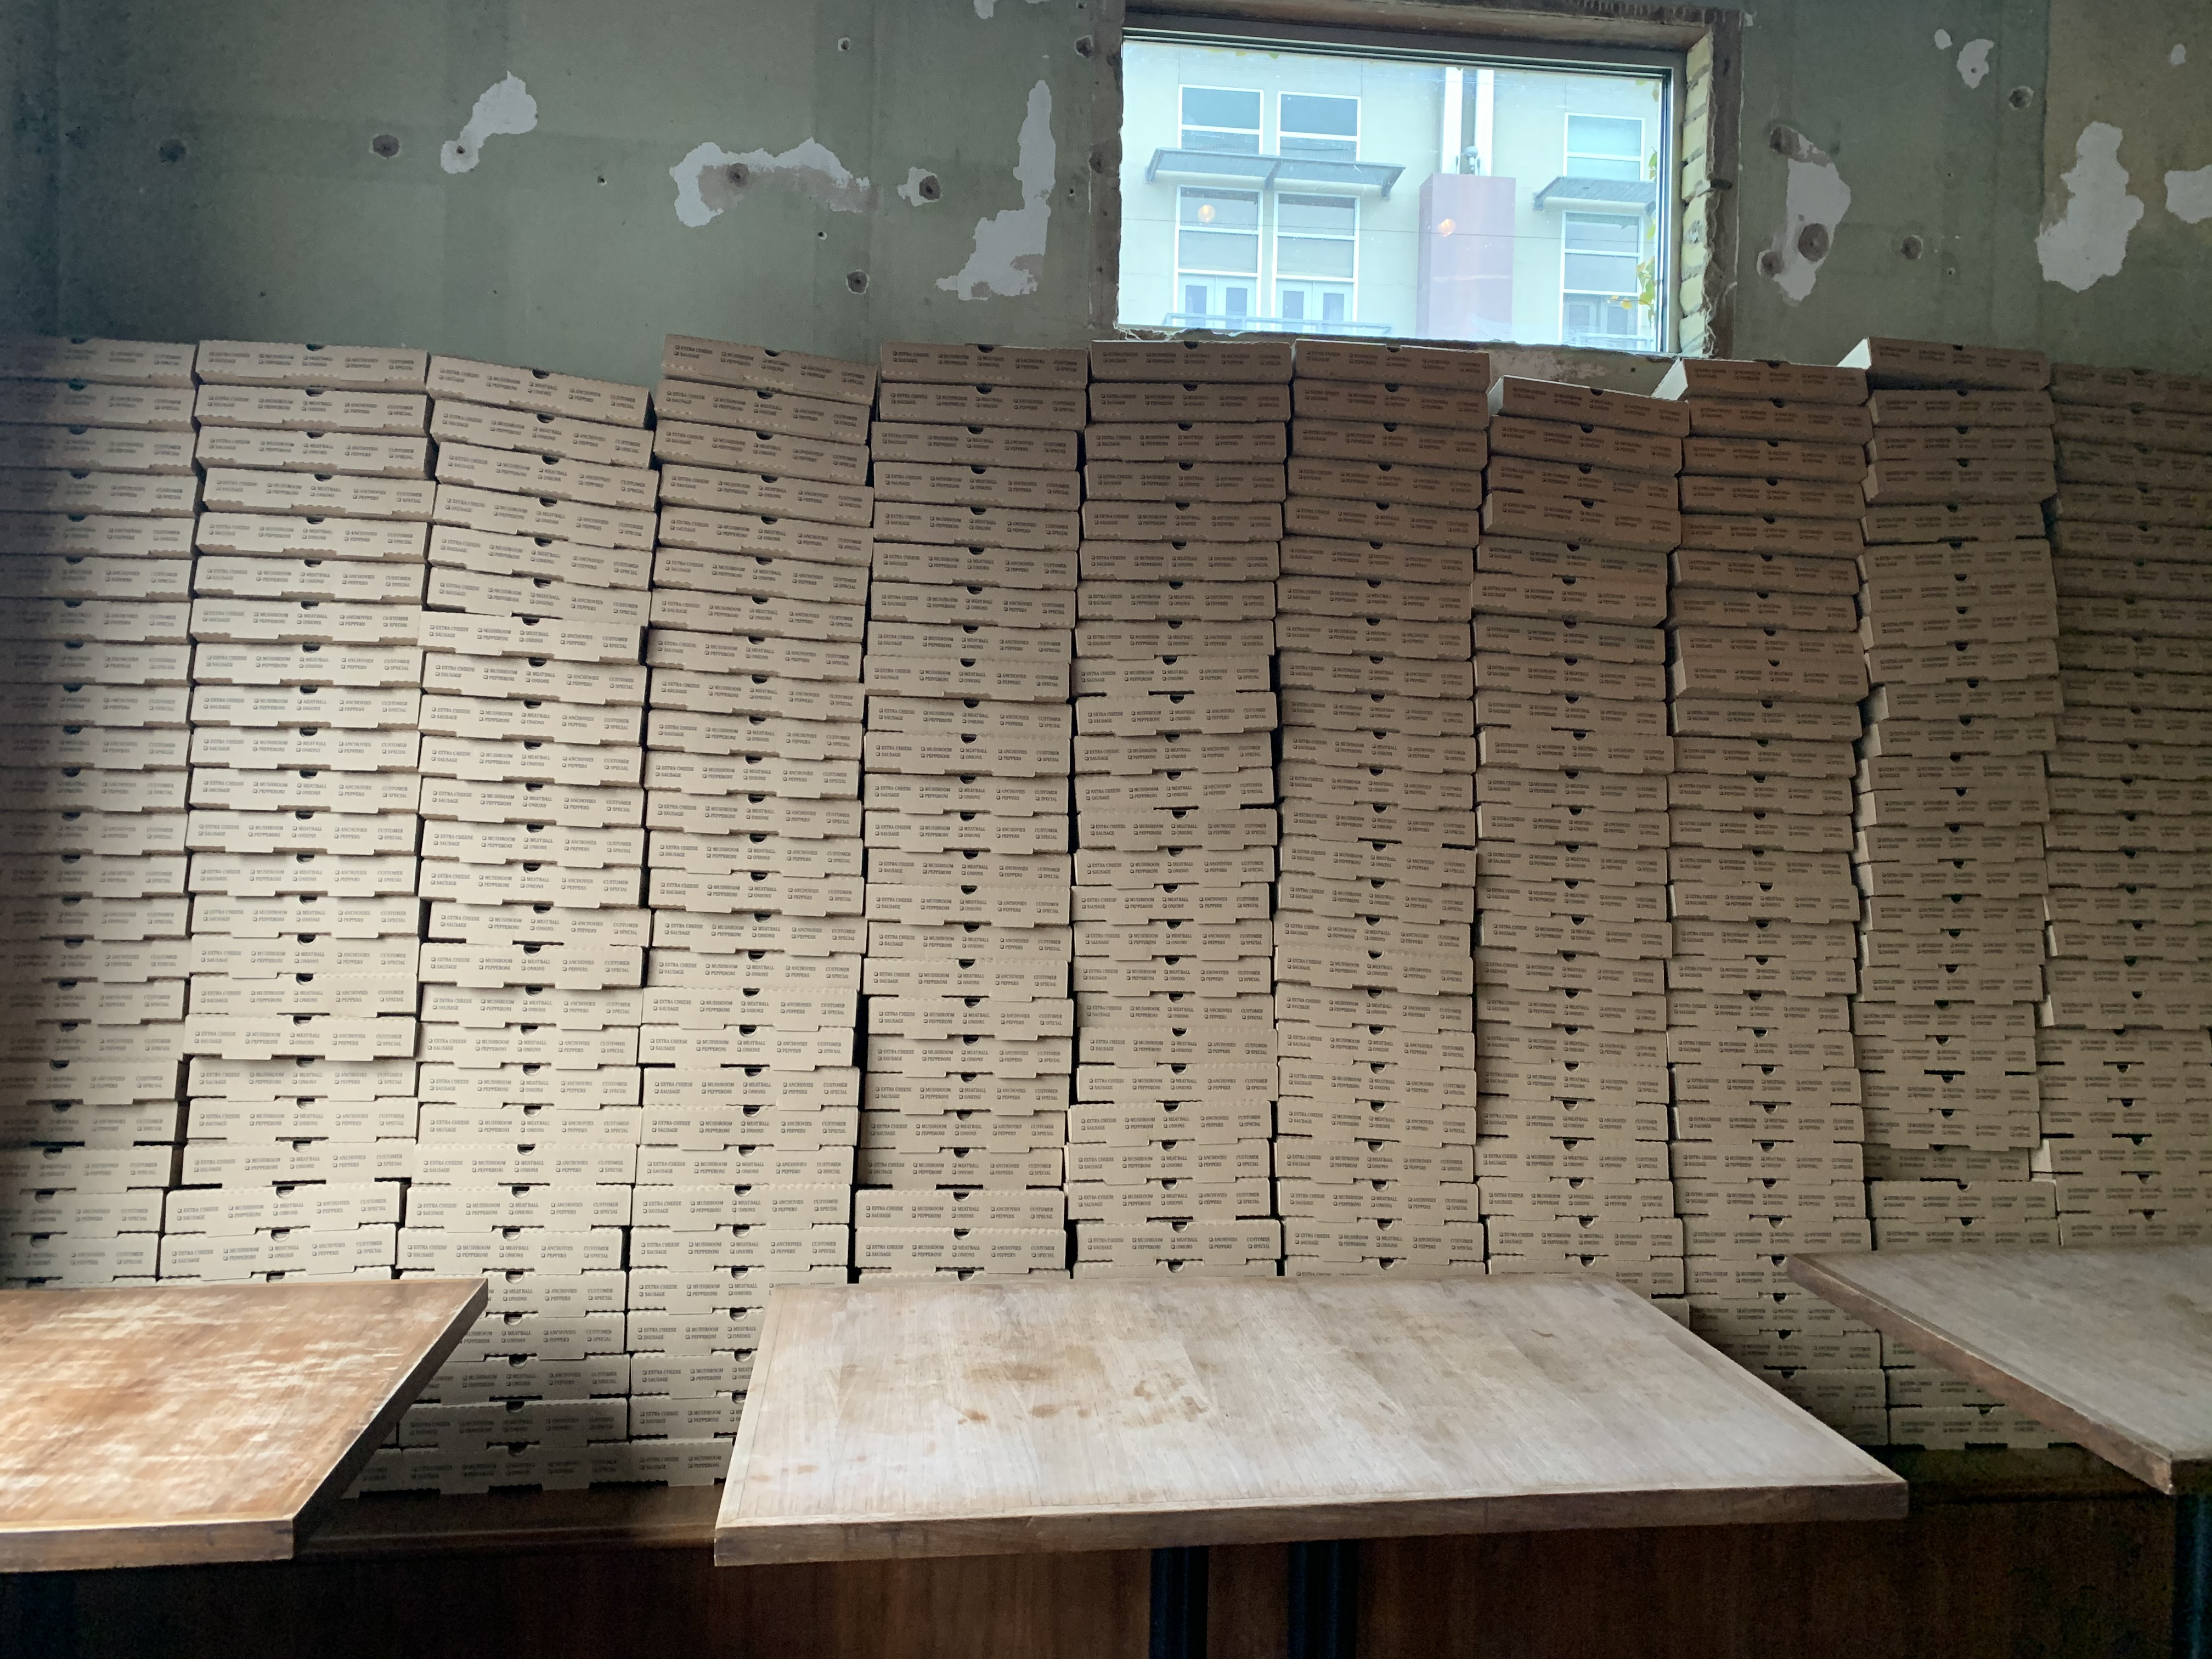 Takeout pizza boxes at Bufalina